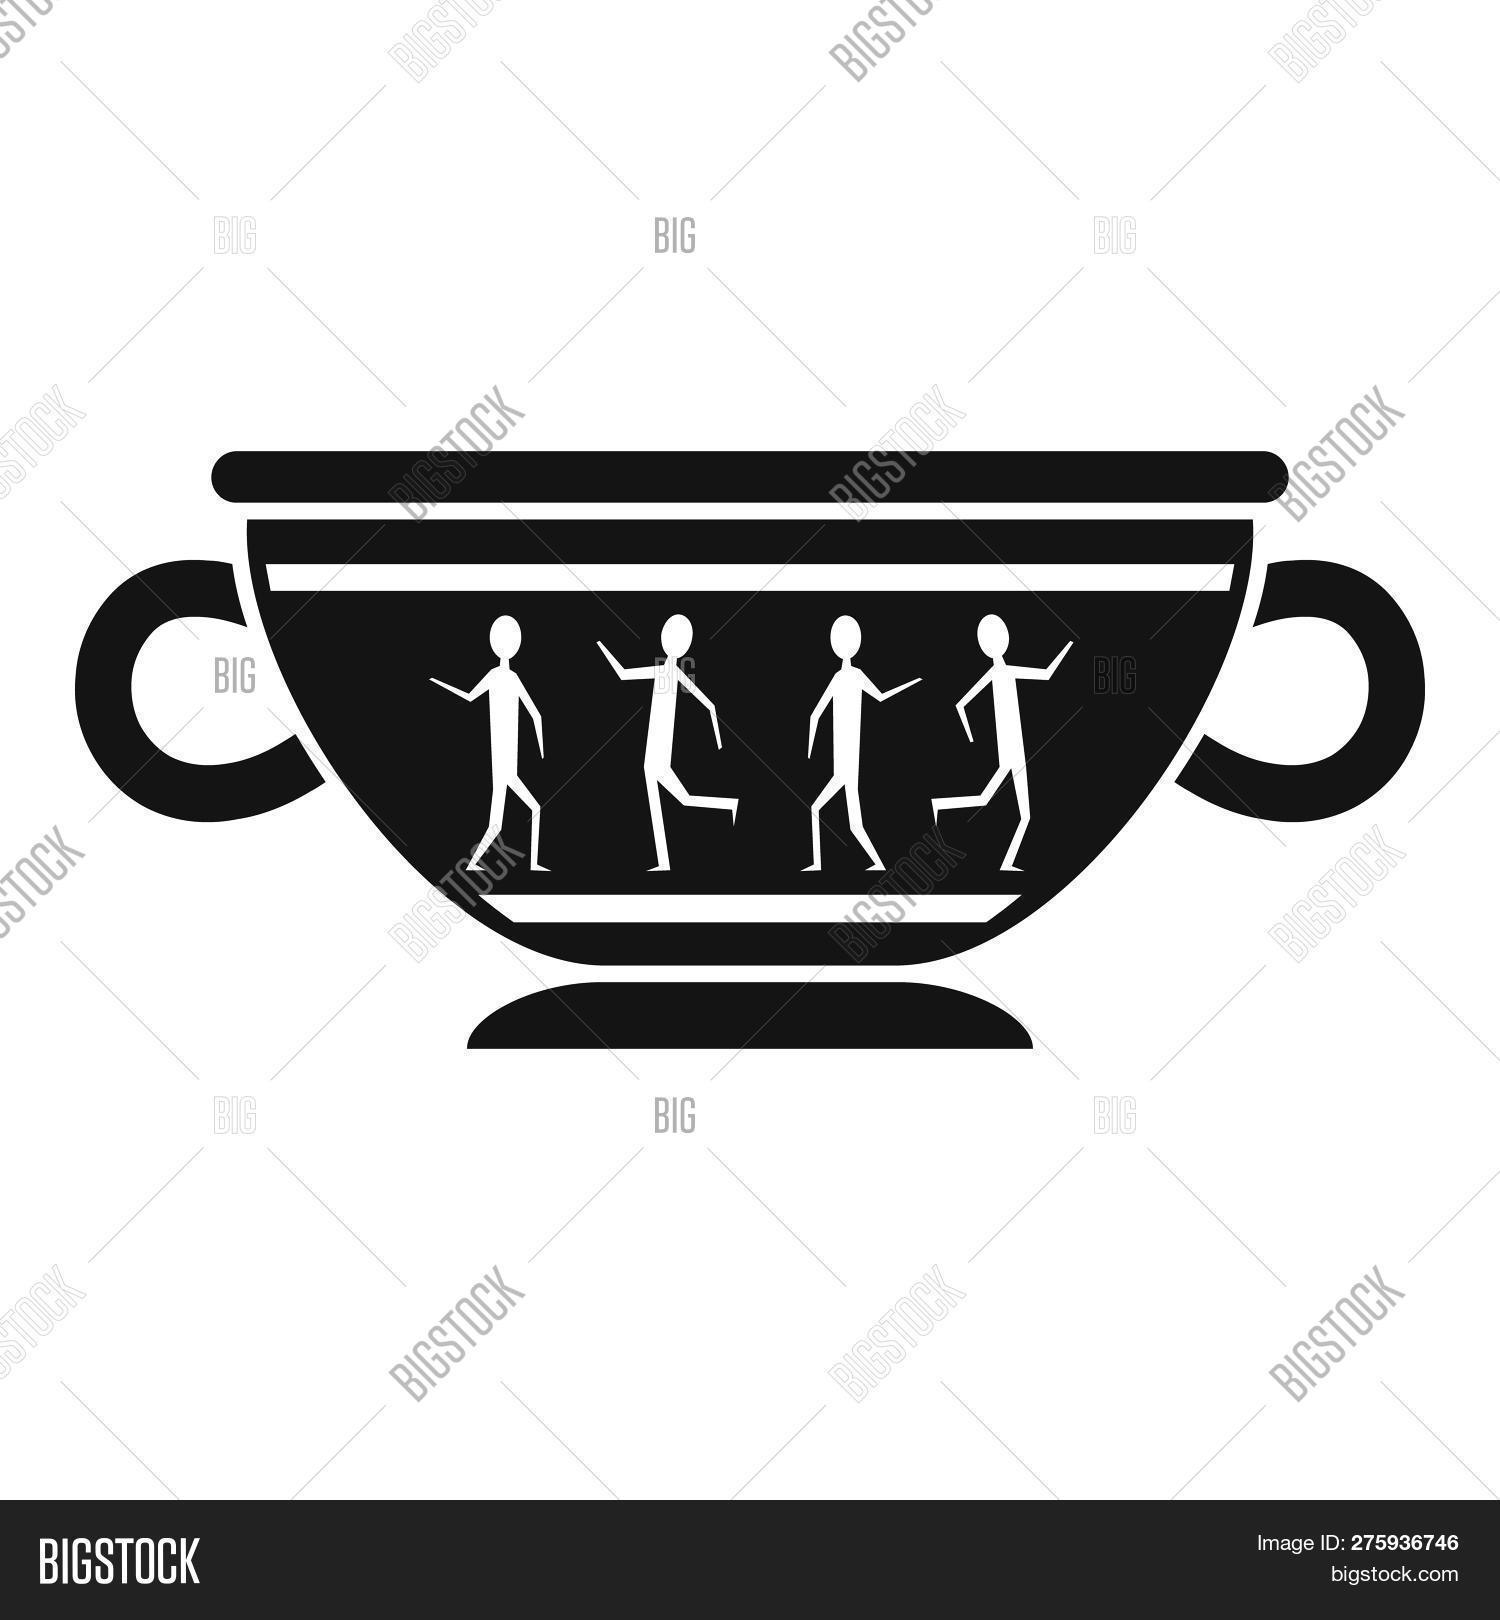 Greek Ancient Bowl Image Photo Free Trial Bigstock